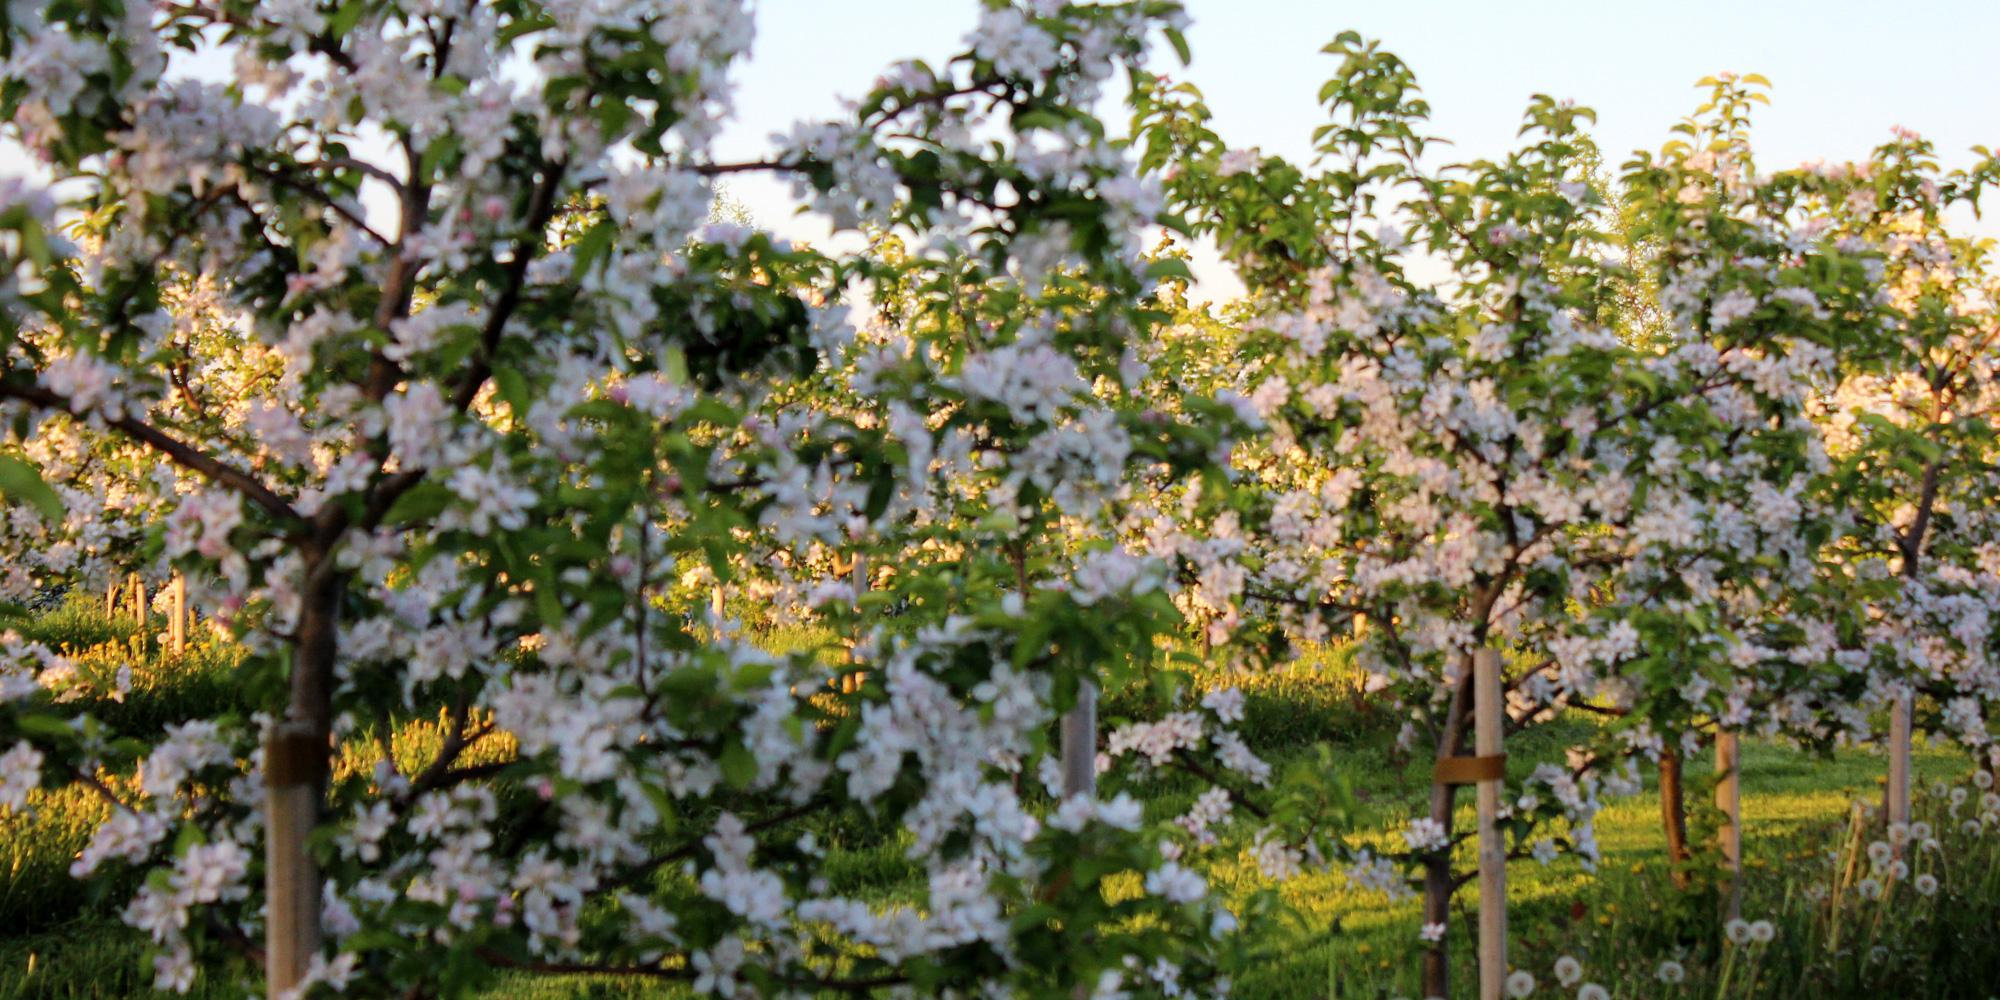 Blomstrende eplehage på Mikkehaug gård. Copyright: Mikkelhaug